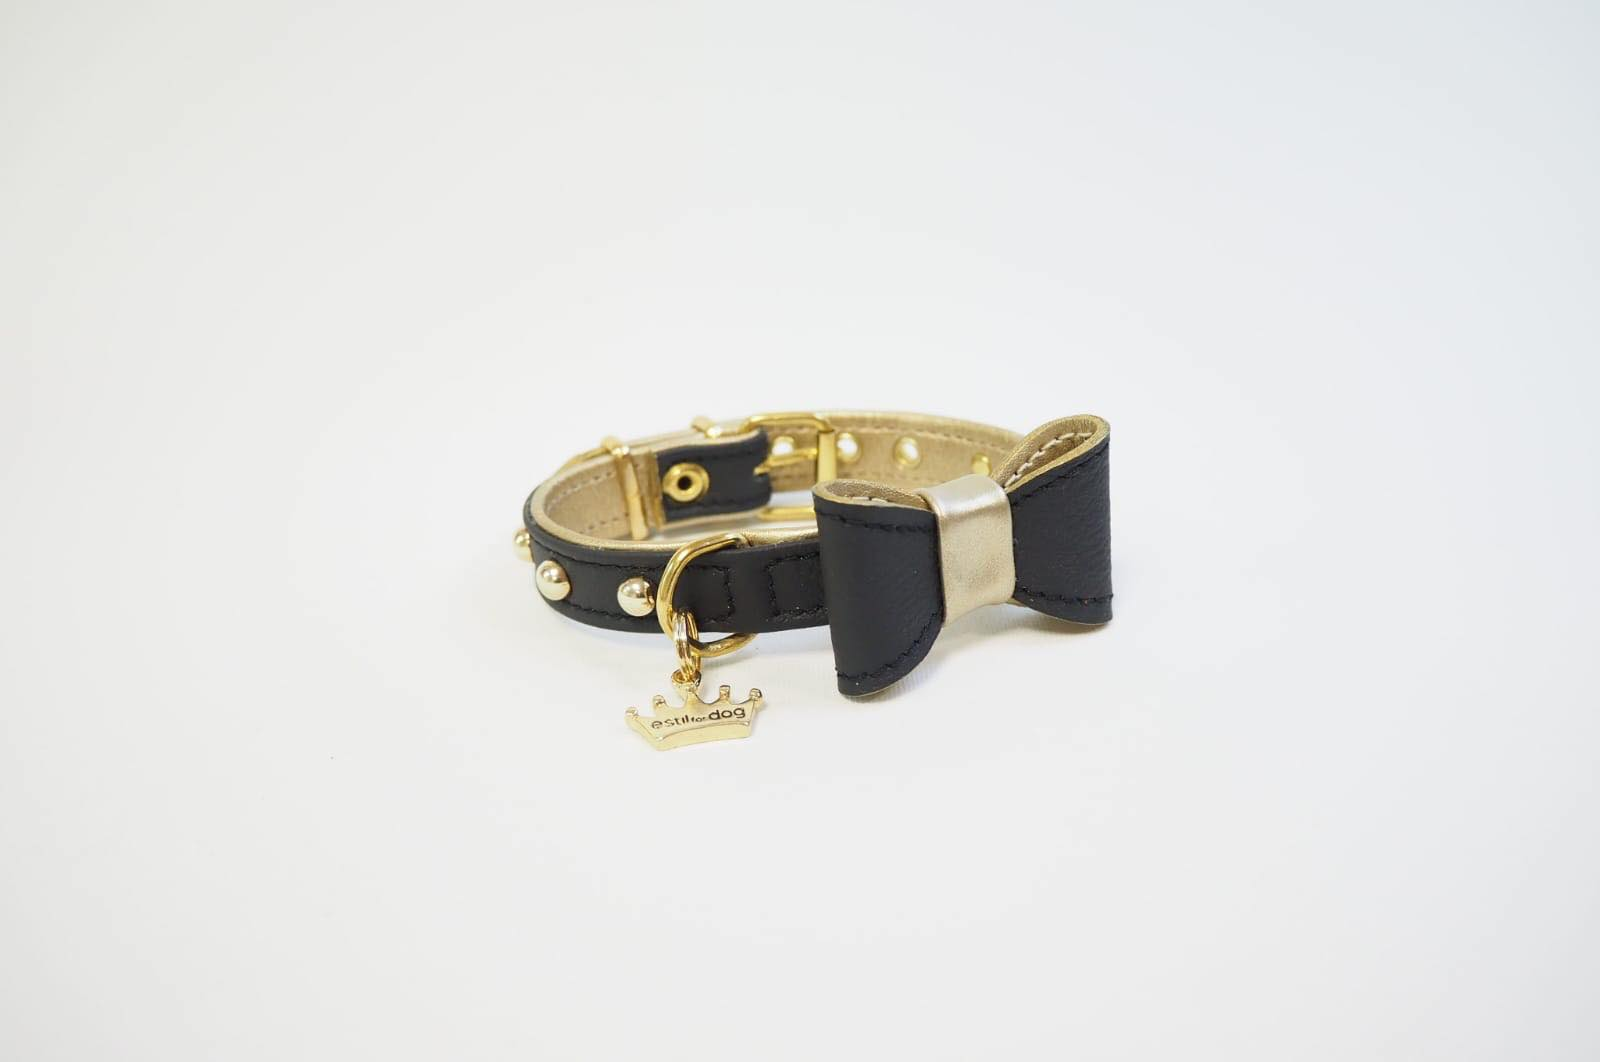 7ec0b7bb018c collar clamor negro de estil for dog para perros pequeños. Criadores de  caniches toy y